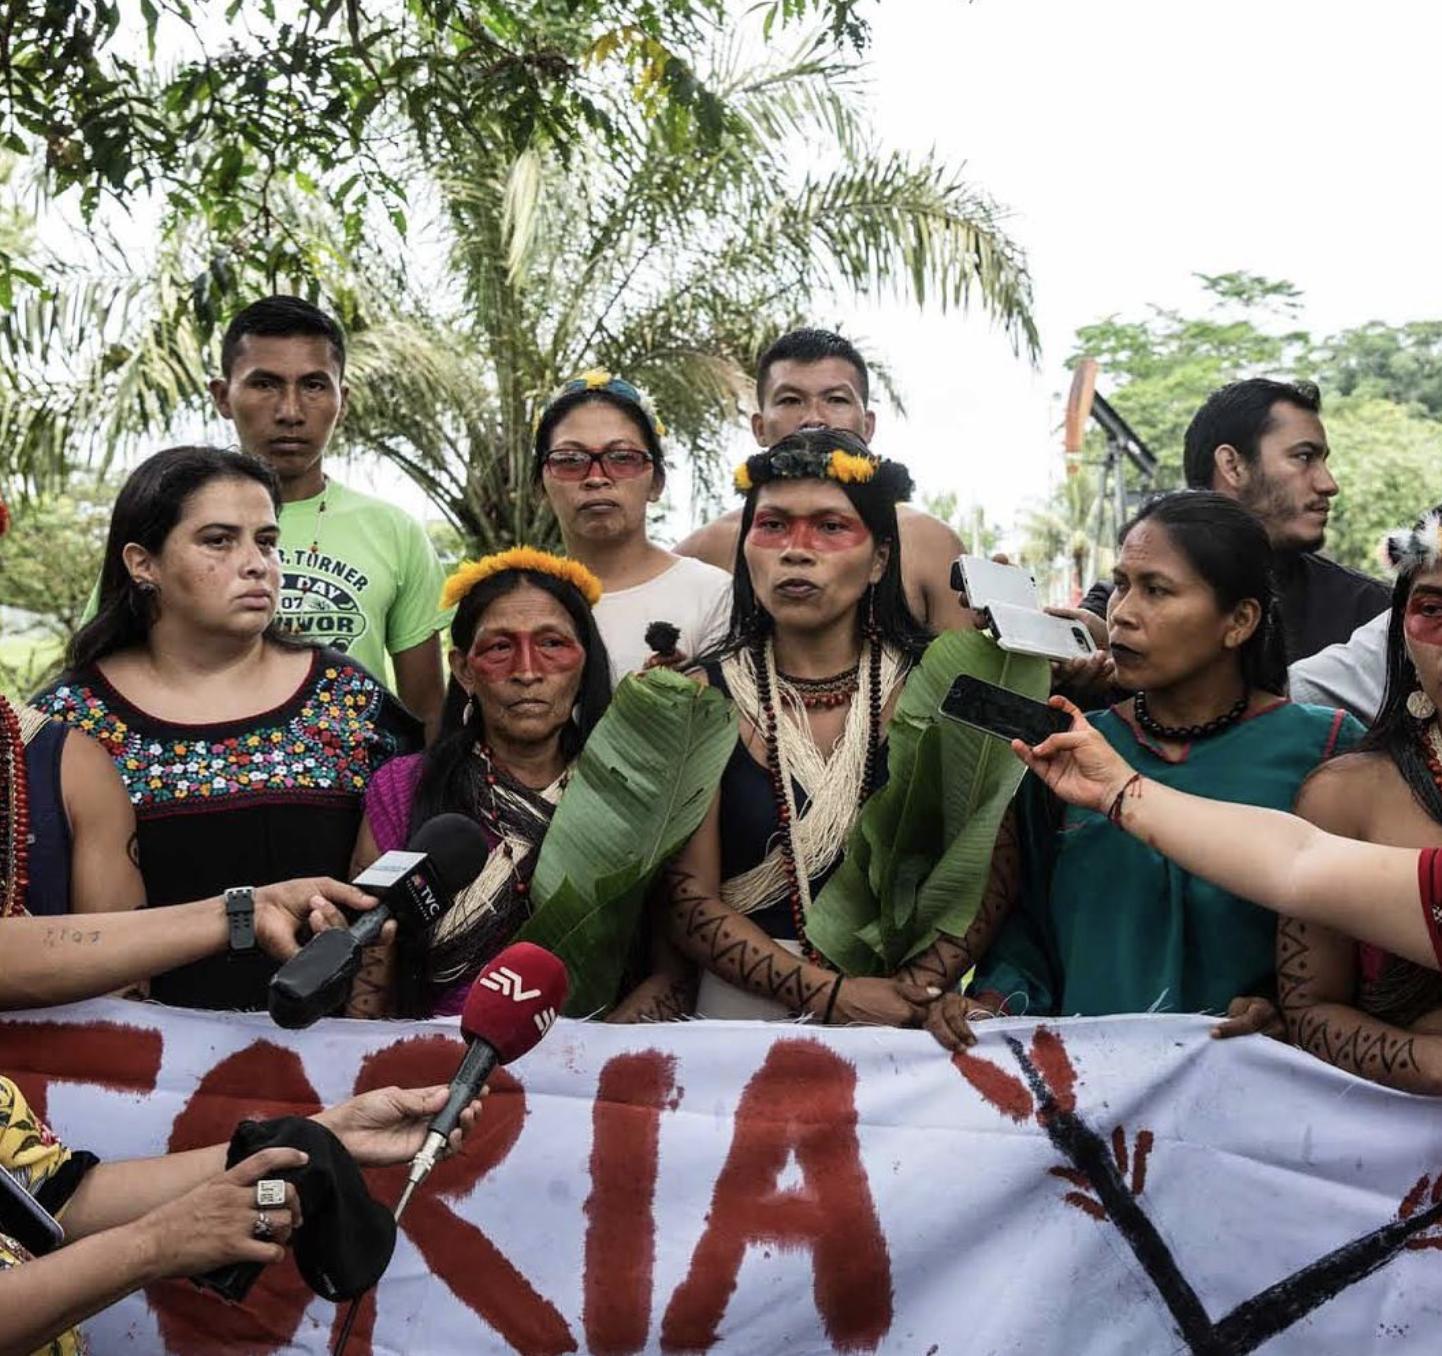 Photo by Amazon Frontlines